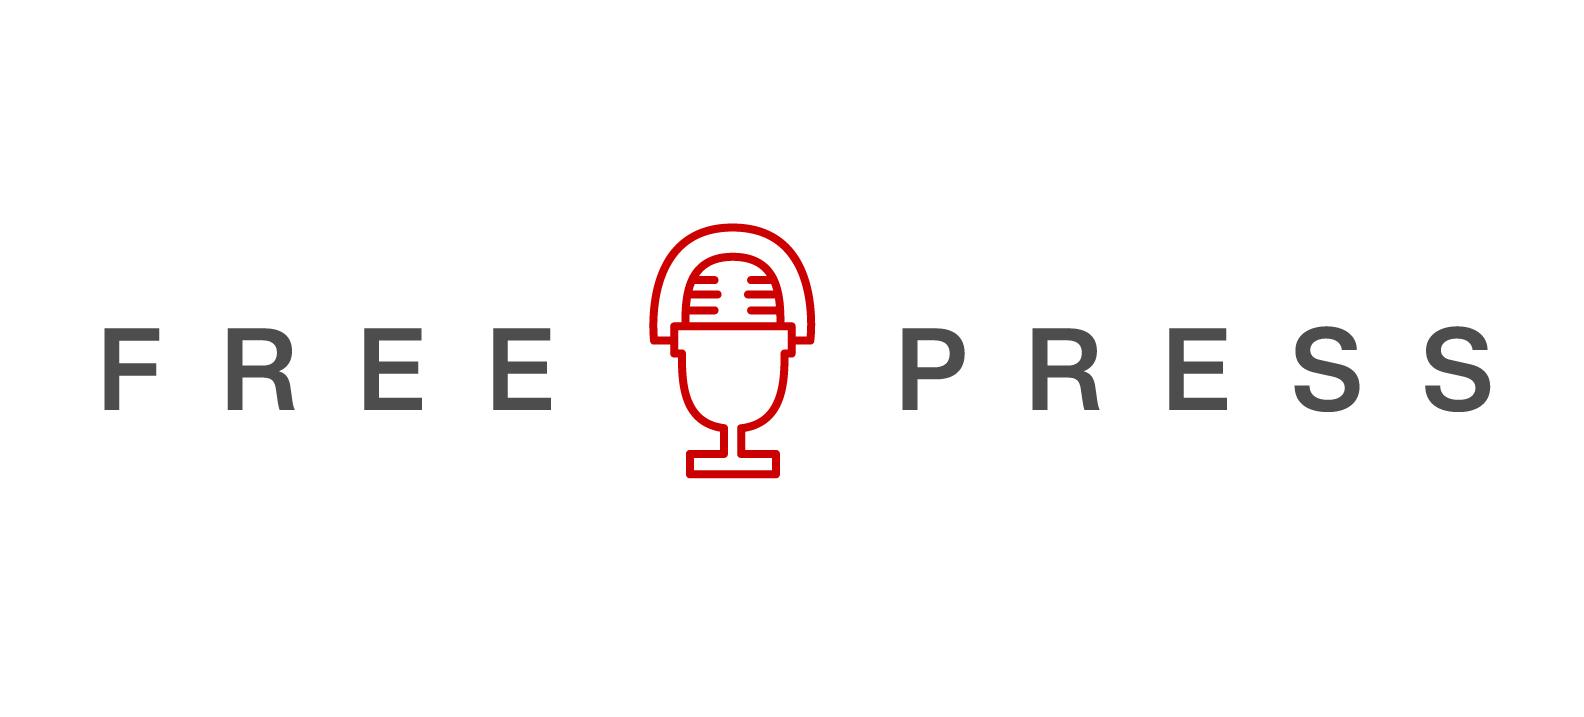 1-free-press-logo-mic.jpg